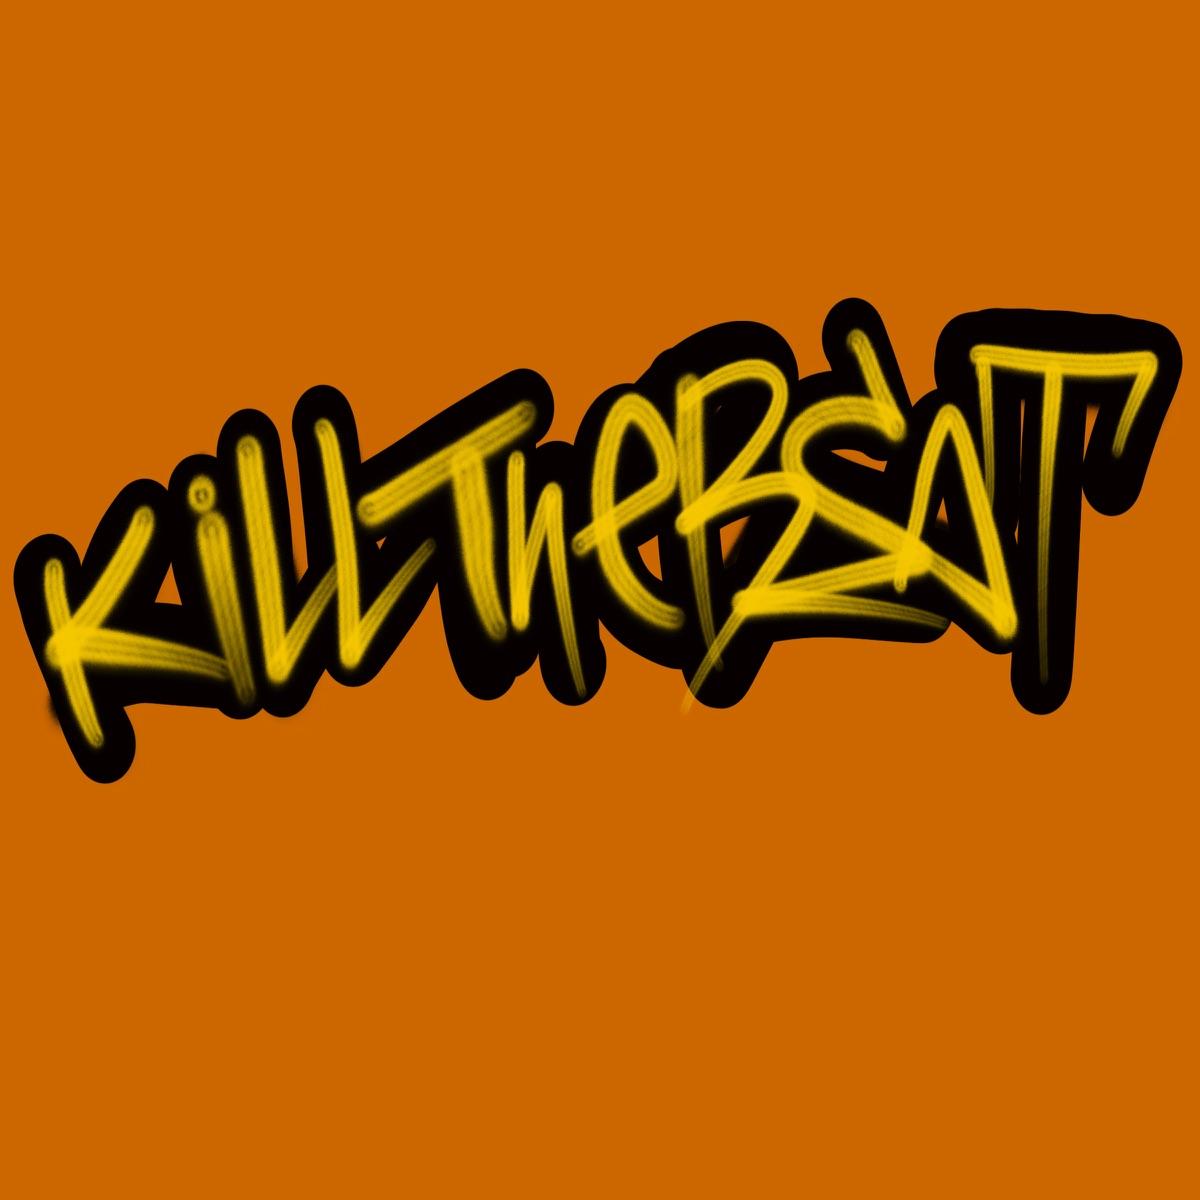 『BACK-ON - Kill the Beat (feat. JESSE)』収録の『Kill the Beat (feat. JESSE)』ジャケット